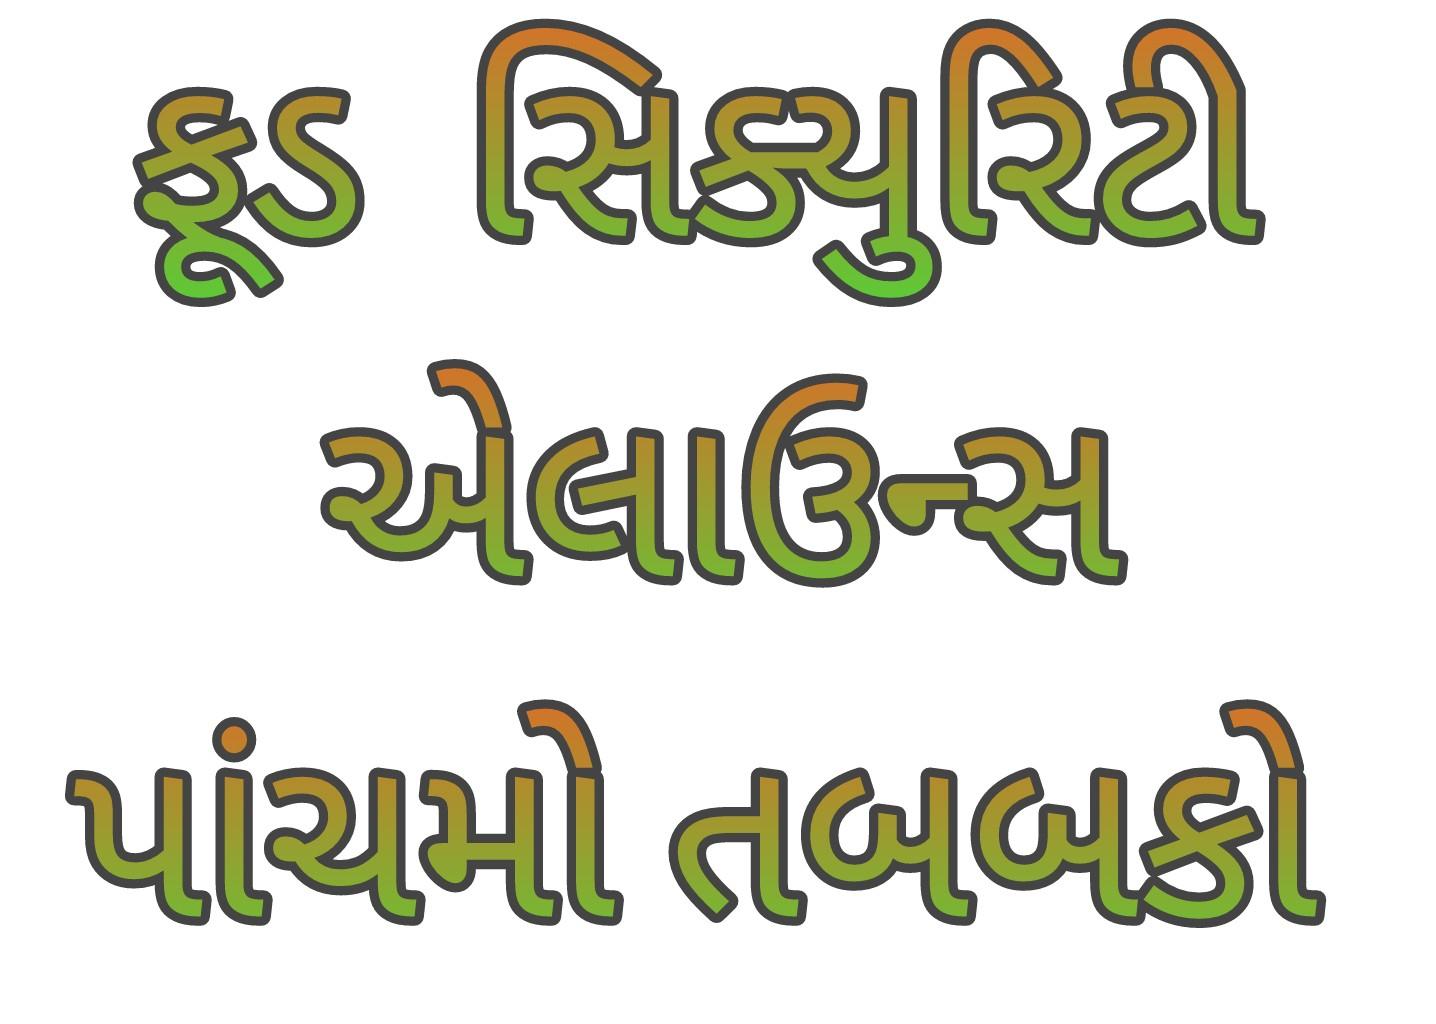 Food Security allowence Phase 5 chakvanu karva mate vidhyarthi sankhya ni mahiti aapva babat paripatra